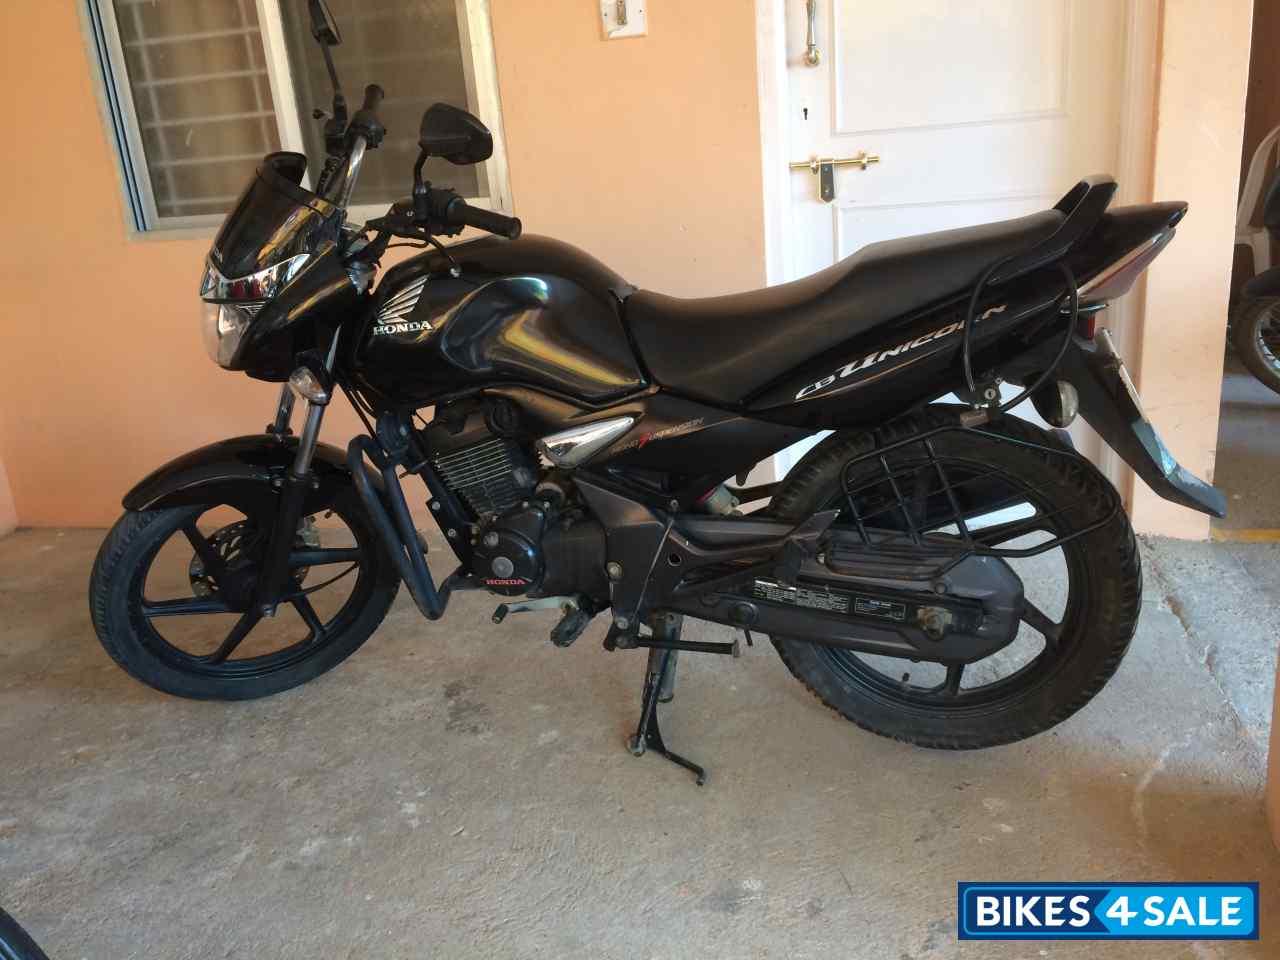 black honda cb unicorn 160 picture 1 bike id 136144 bike located in bangalore bikes4sale. Black Bedroom Furniture Sets. Home Design Ideas